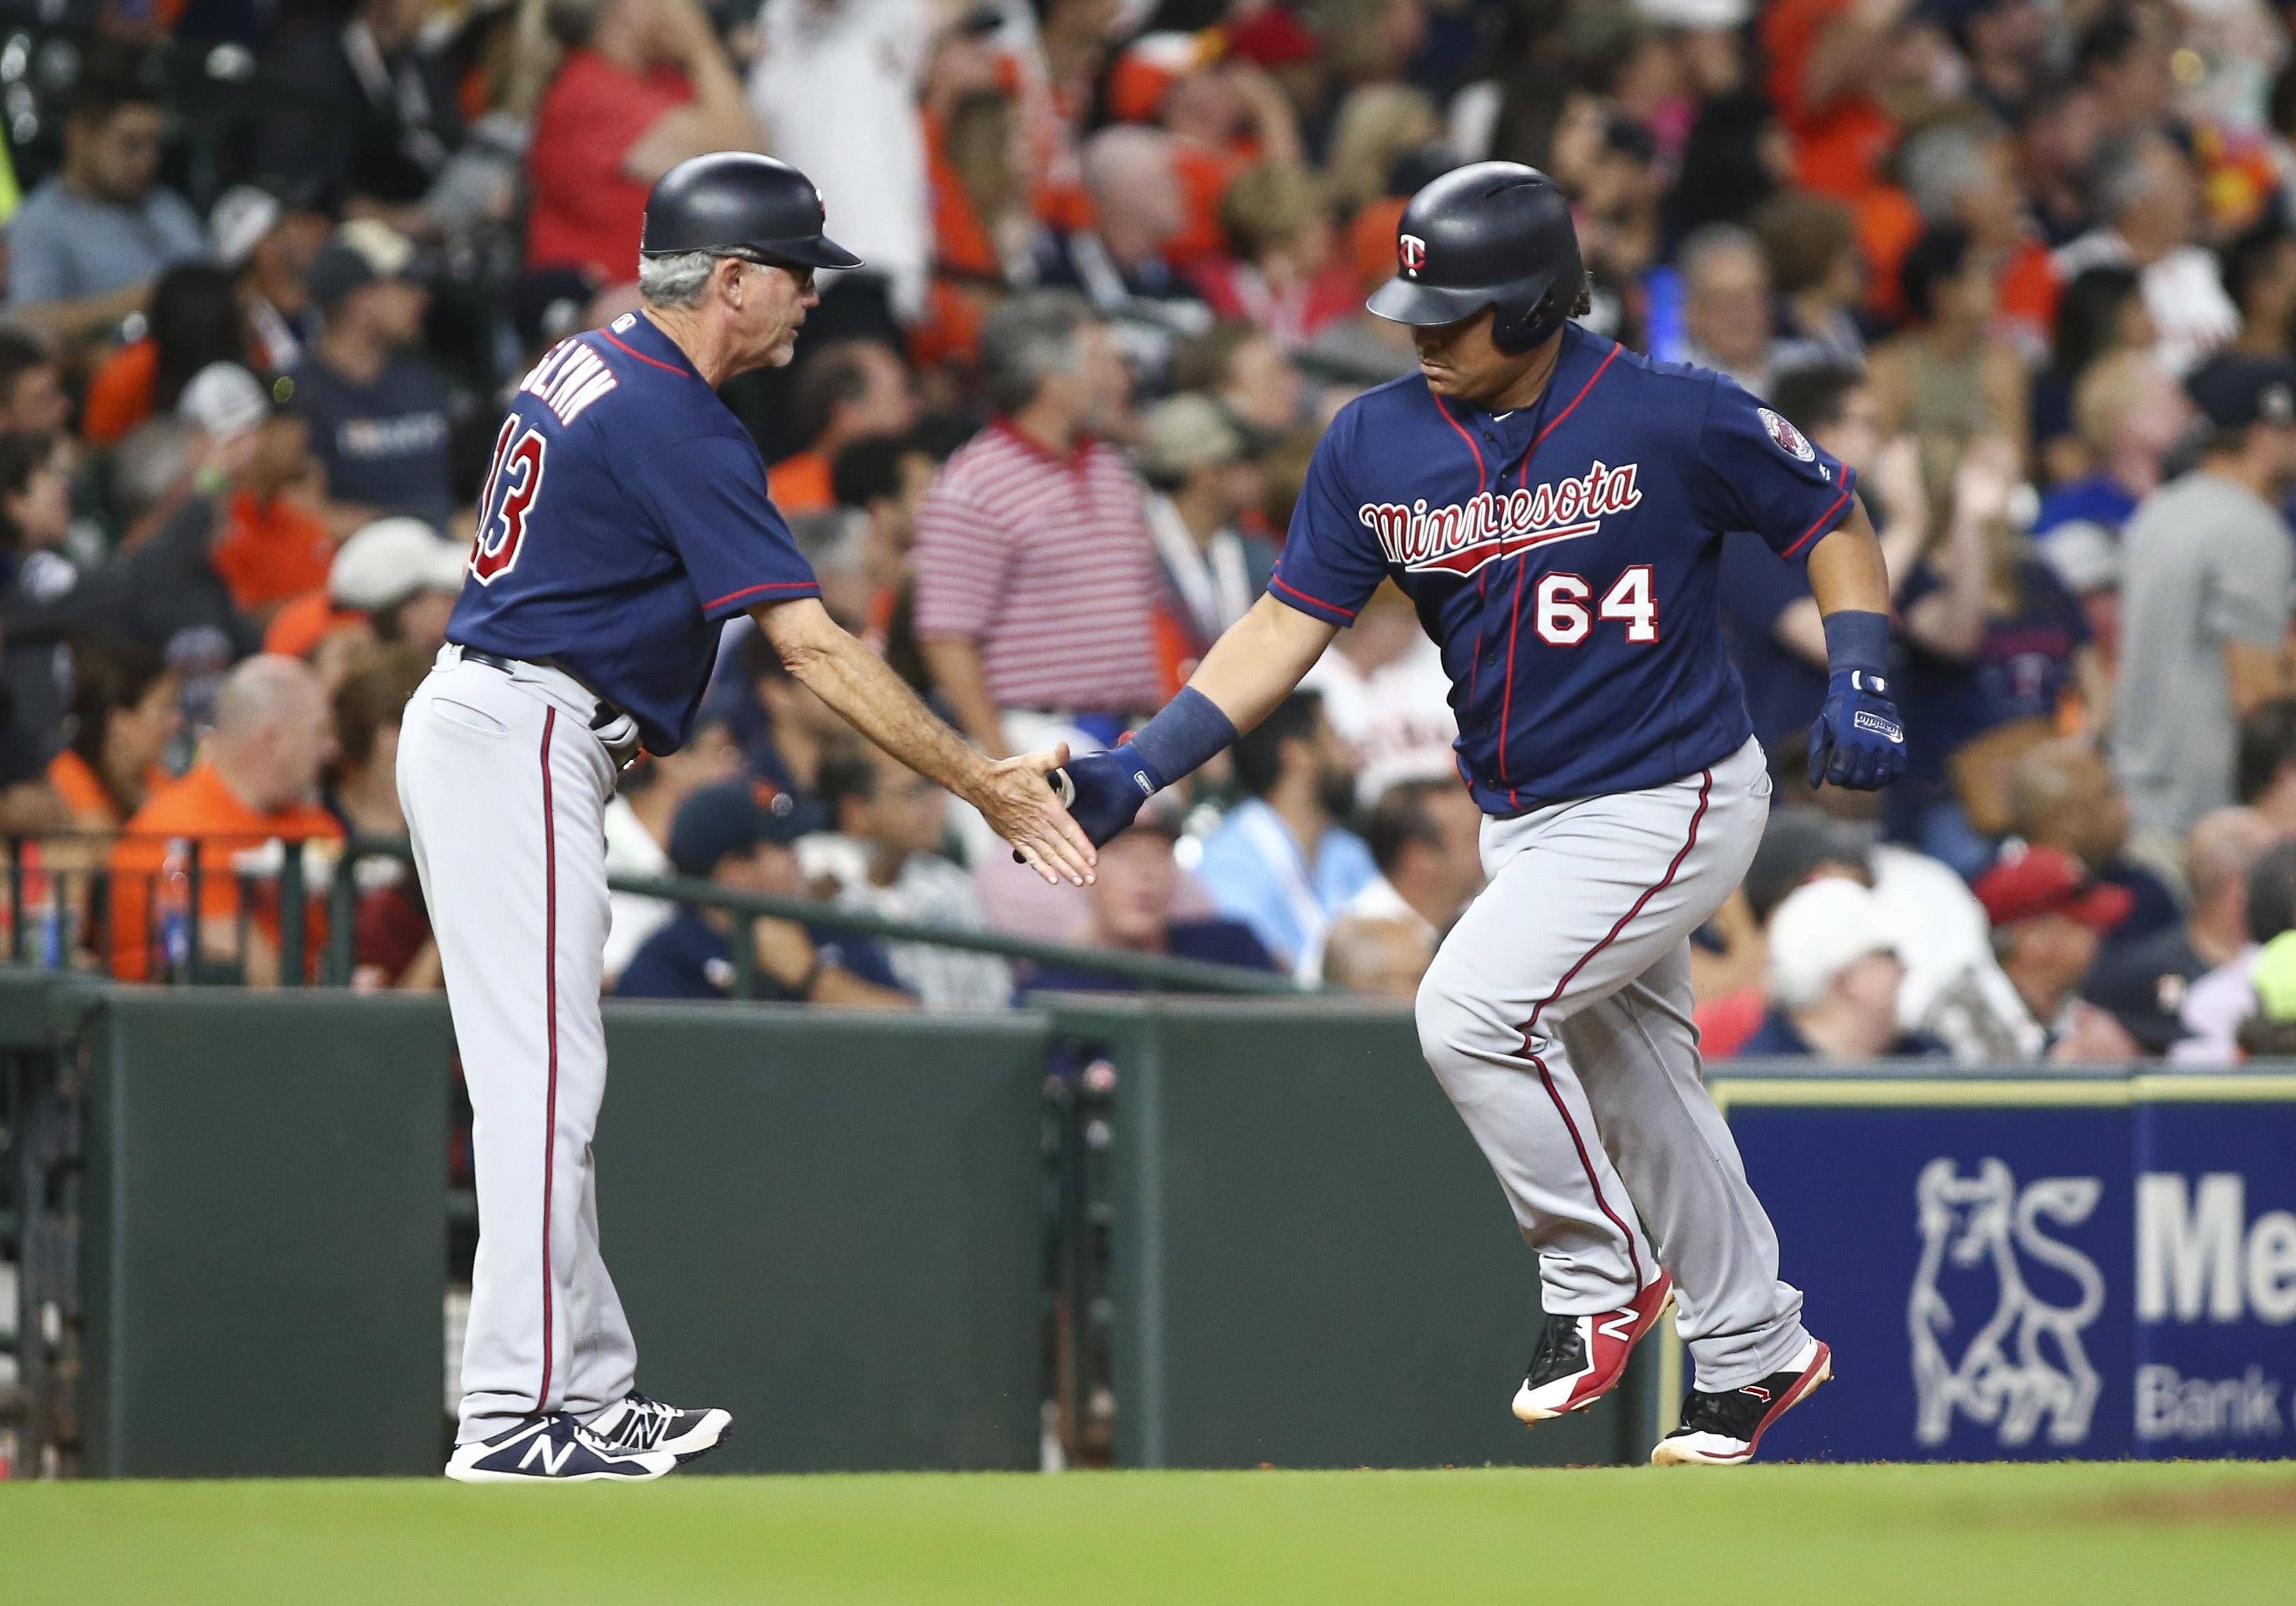 MLB: Minnesota Twins at Houston Astros